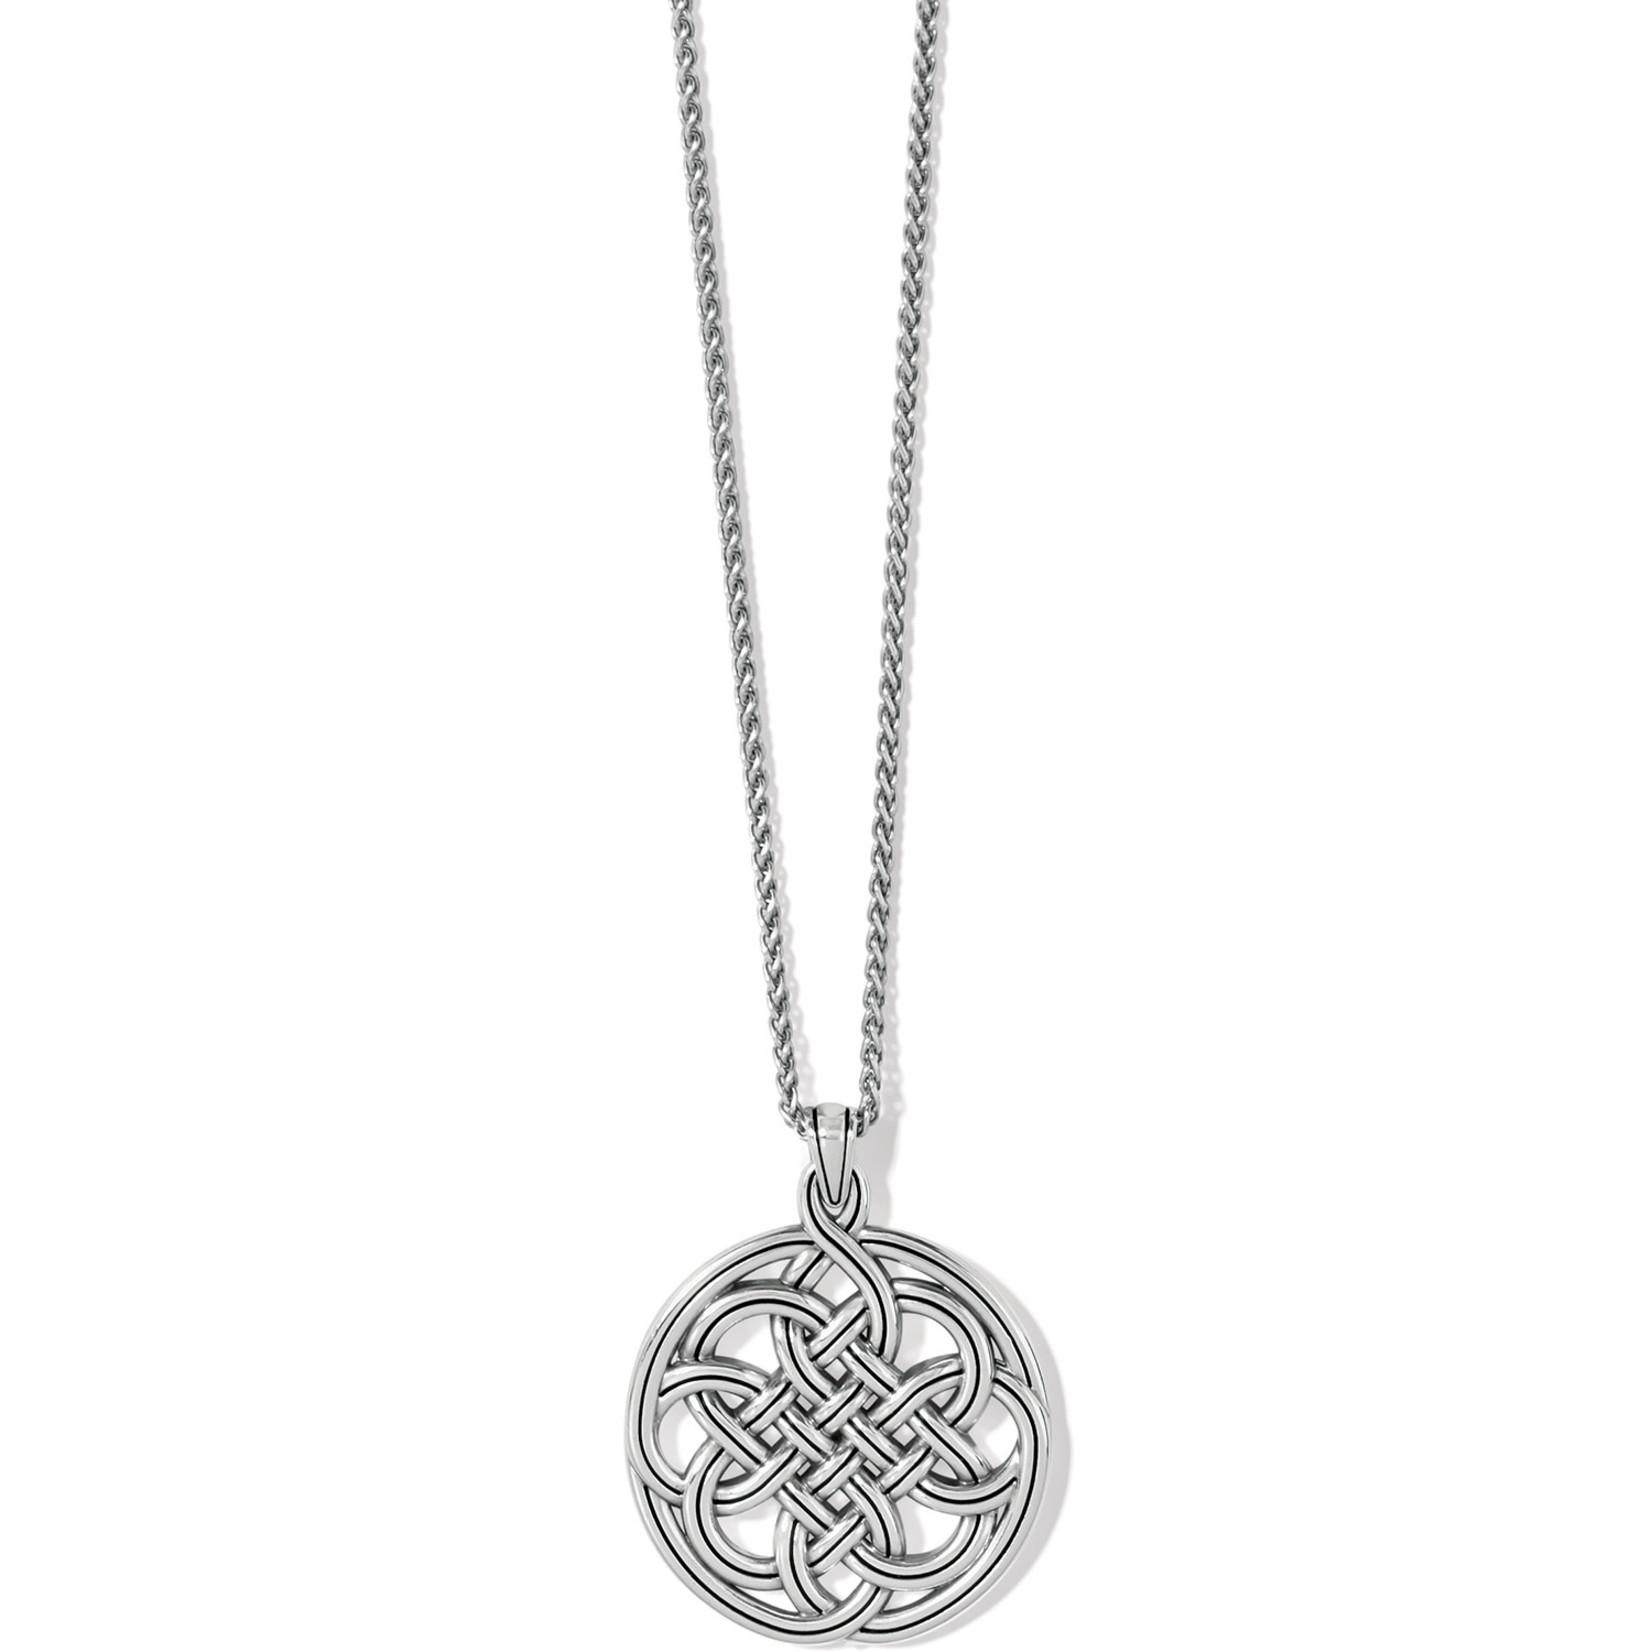 Brighton Interlok Medallion Necklace - Silver